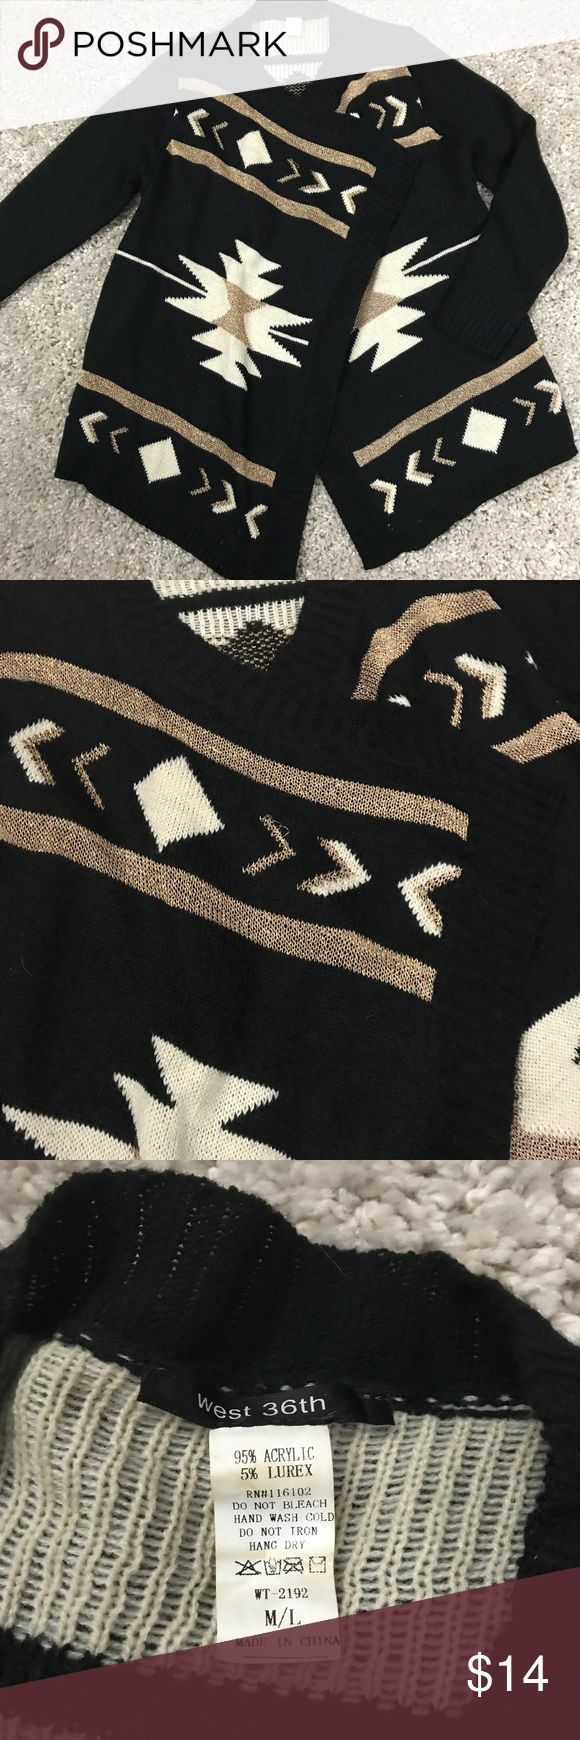 Tribal print cardigan size M/L Tribal print black cardigan with glitter detail. Size M/L west 36th Sweaters Cardigans